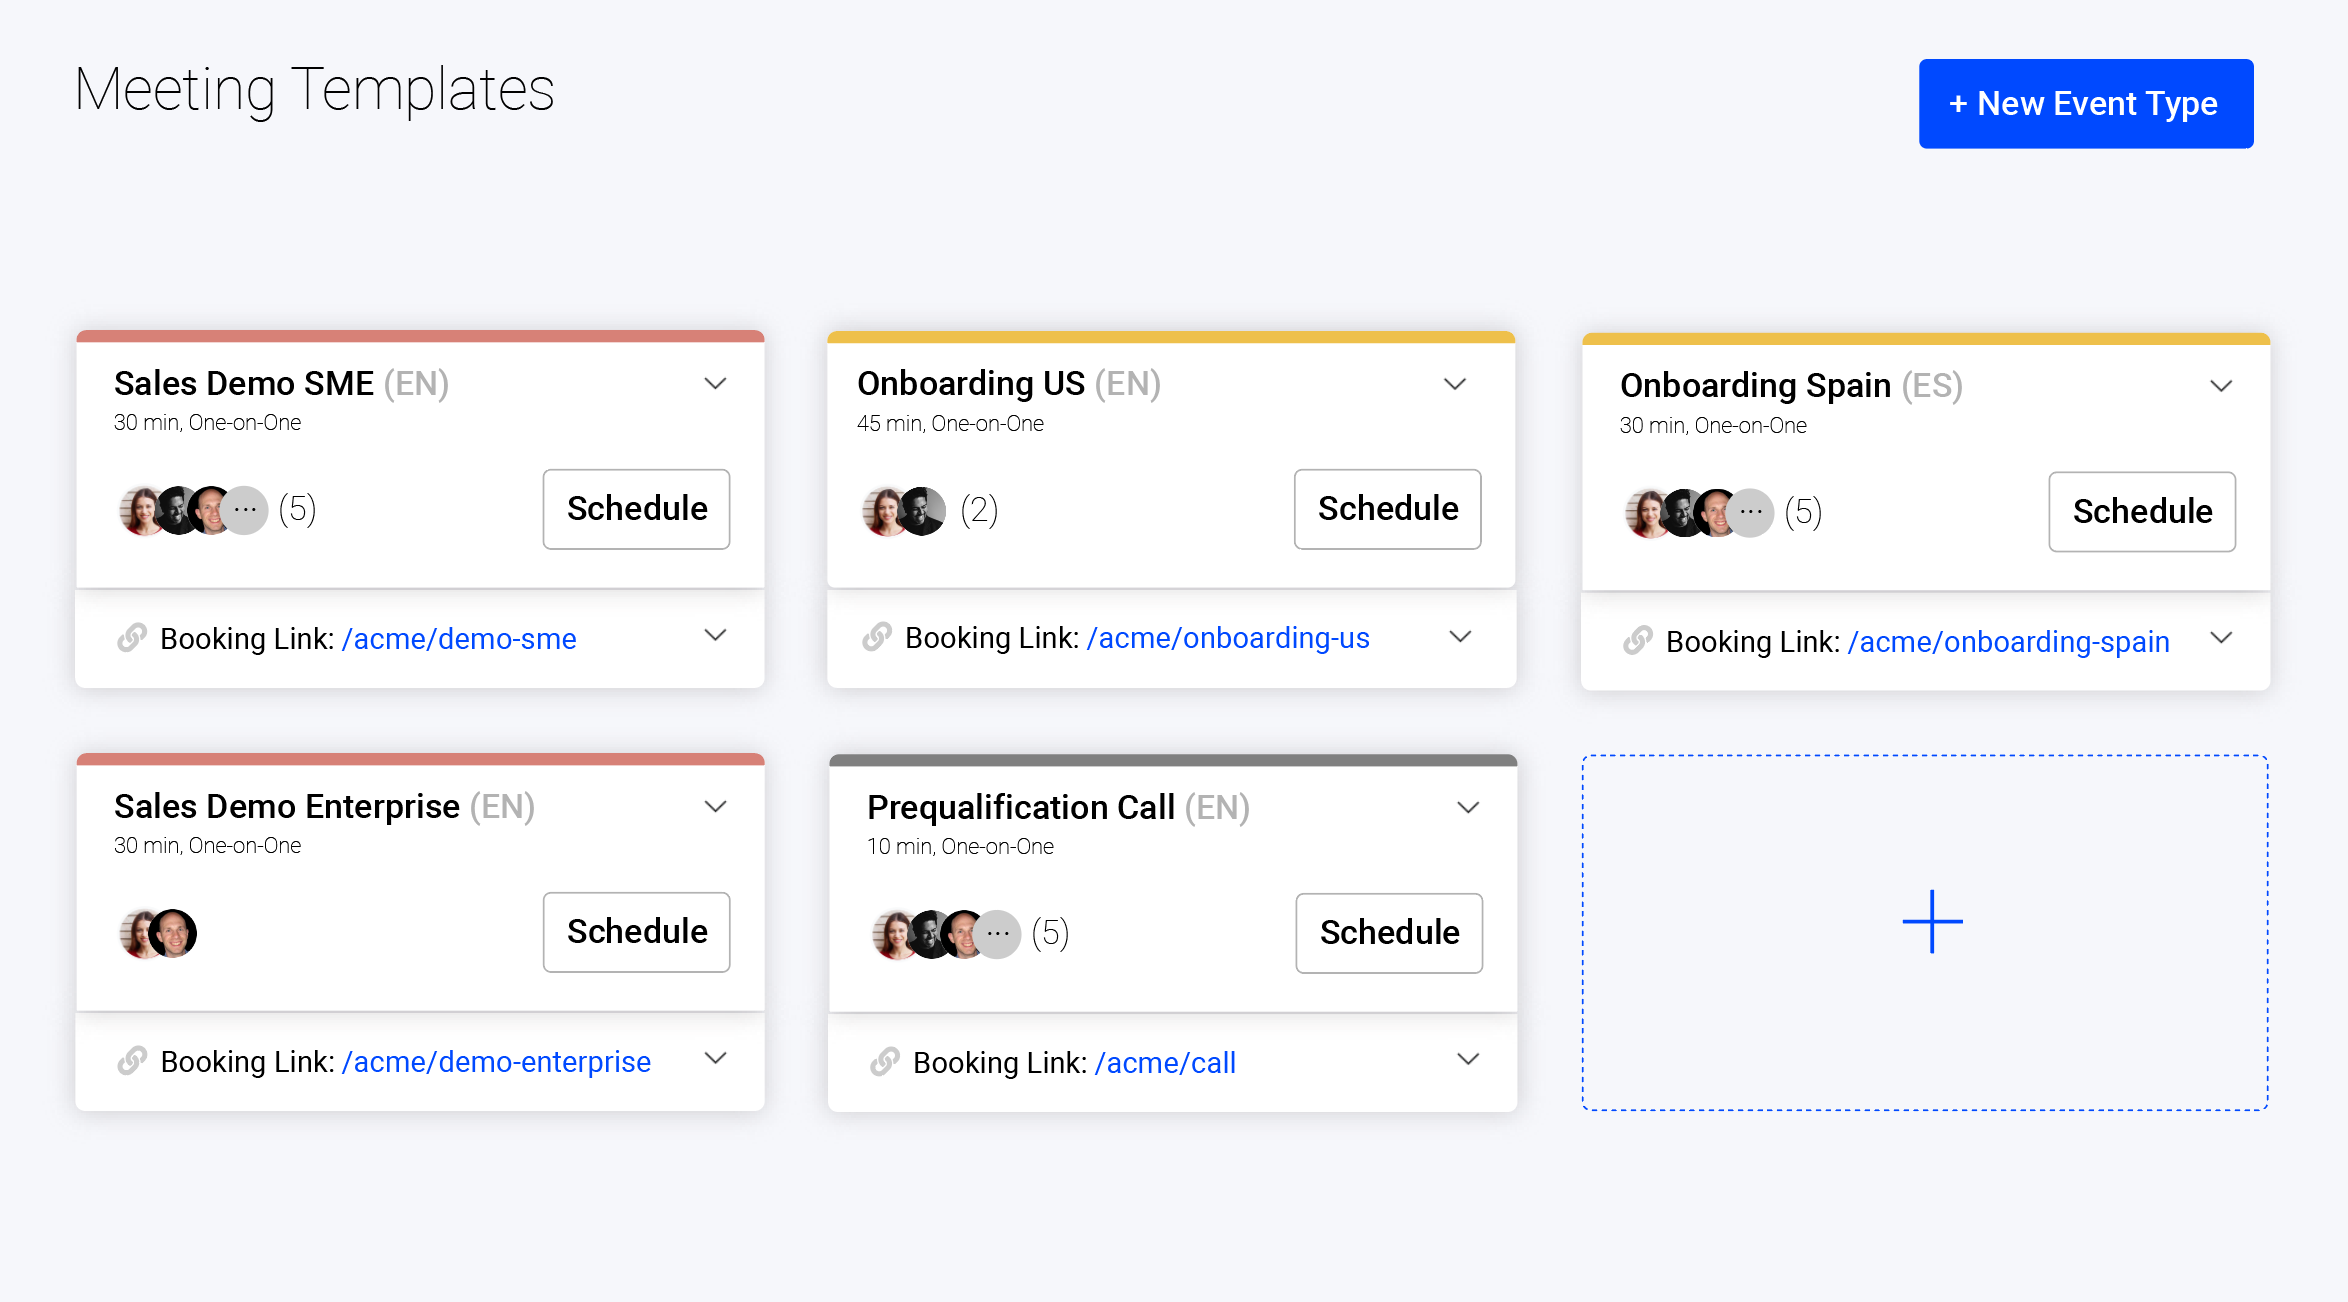 Demodesk: Meeting Templates